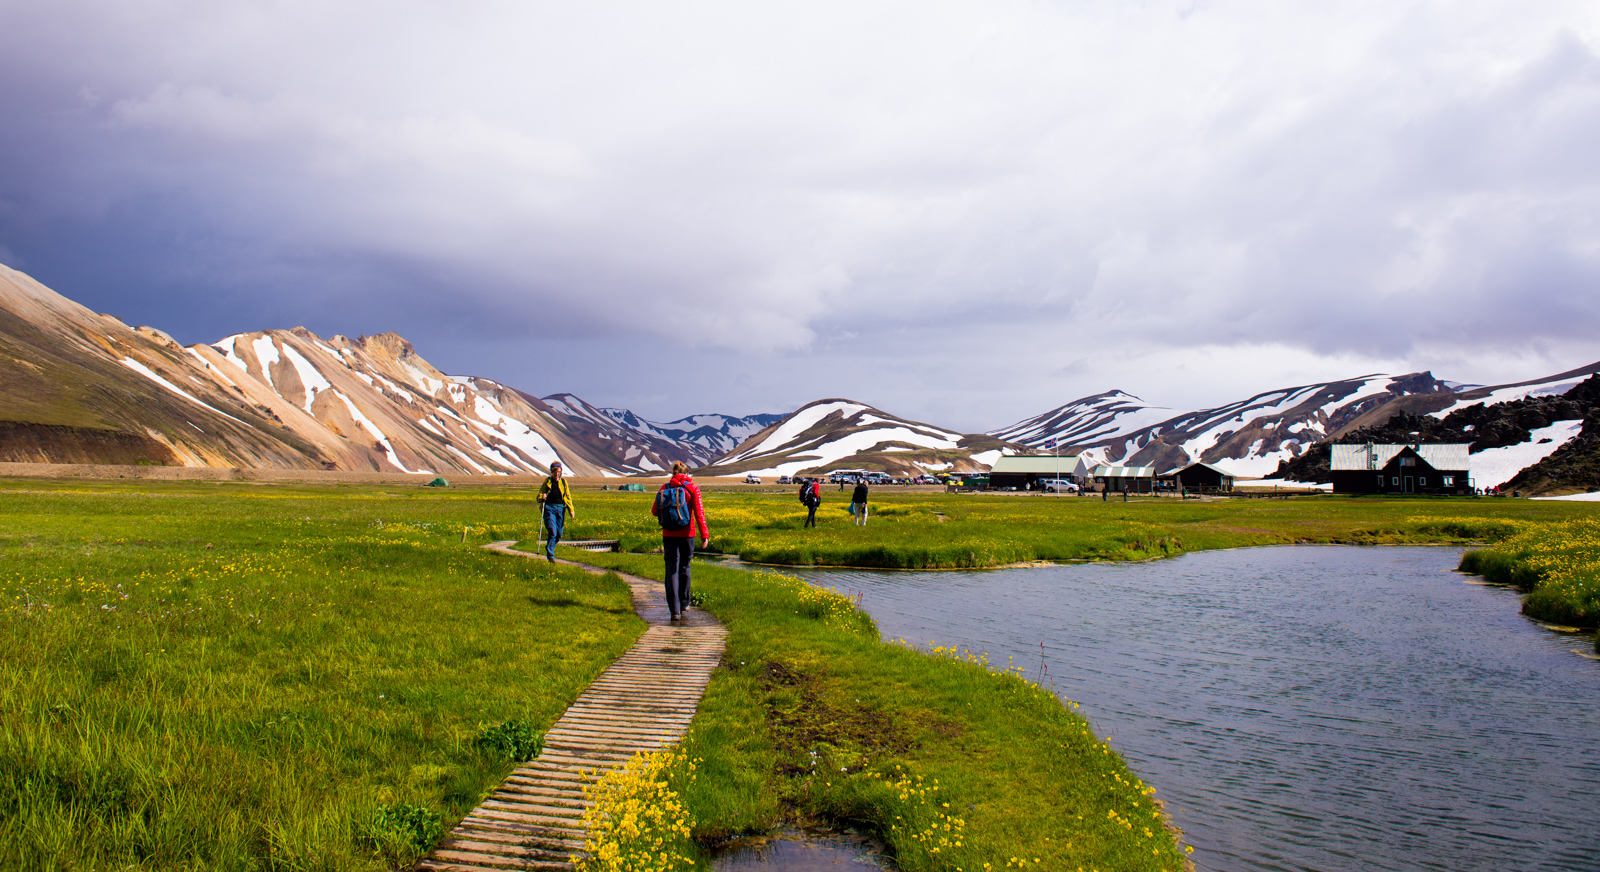 iceland_day_06_landmannalauger-78.jpg